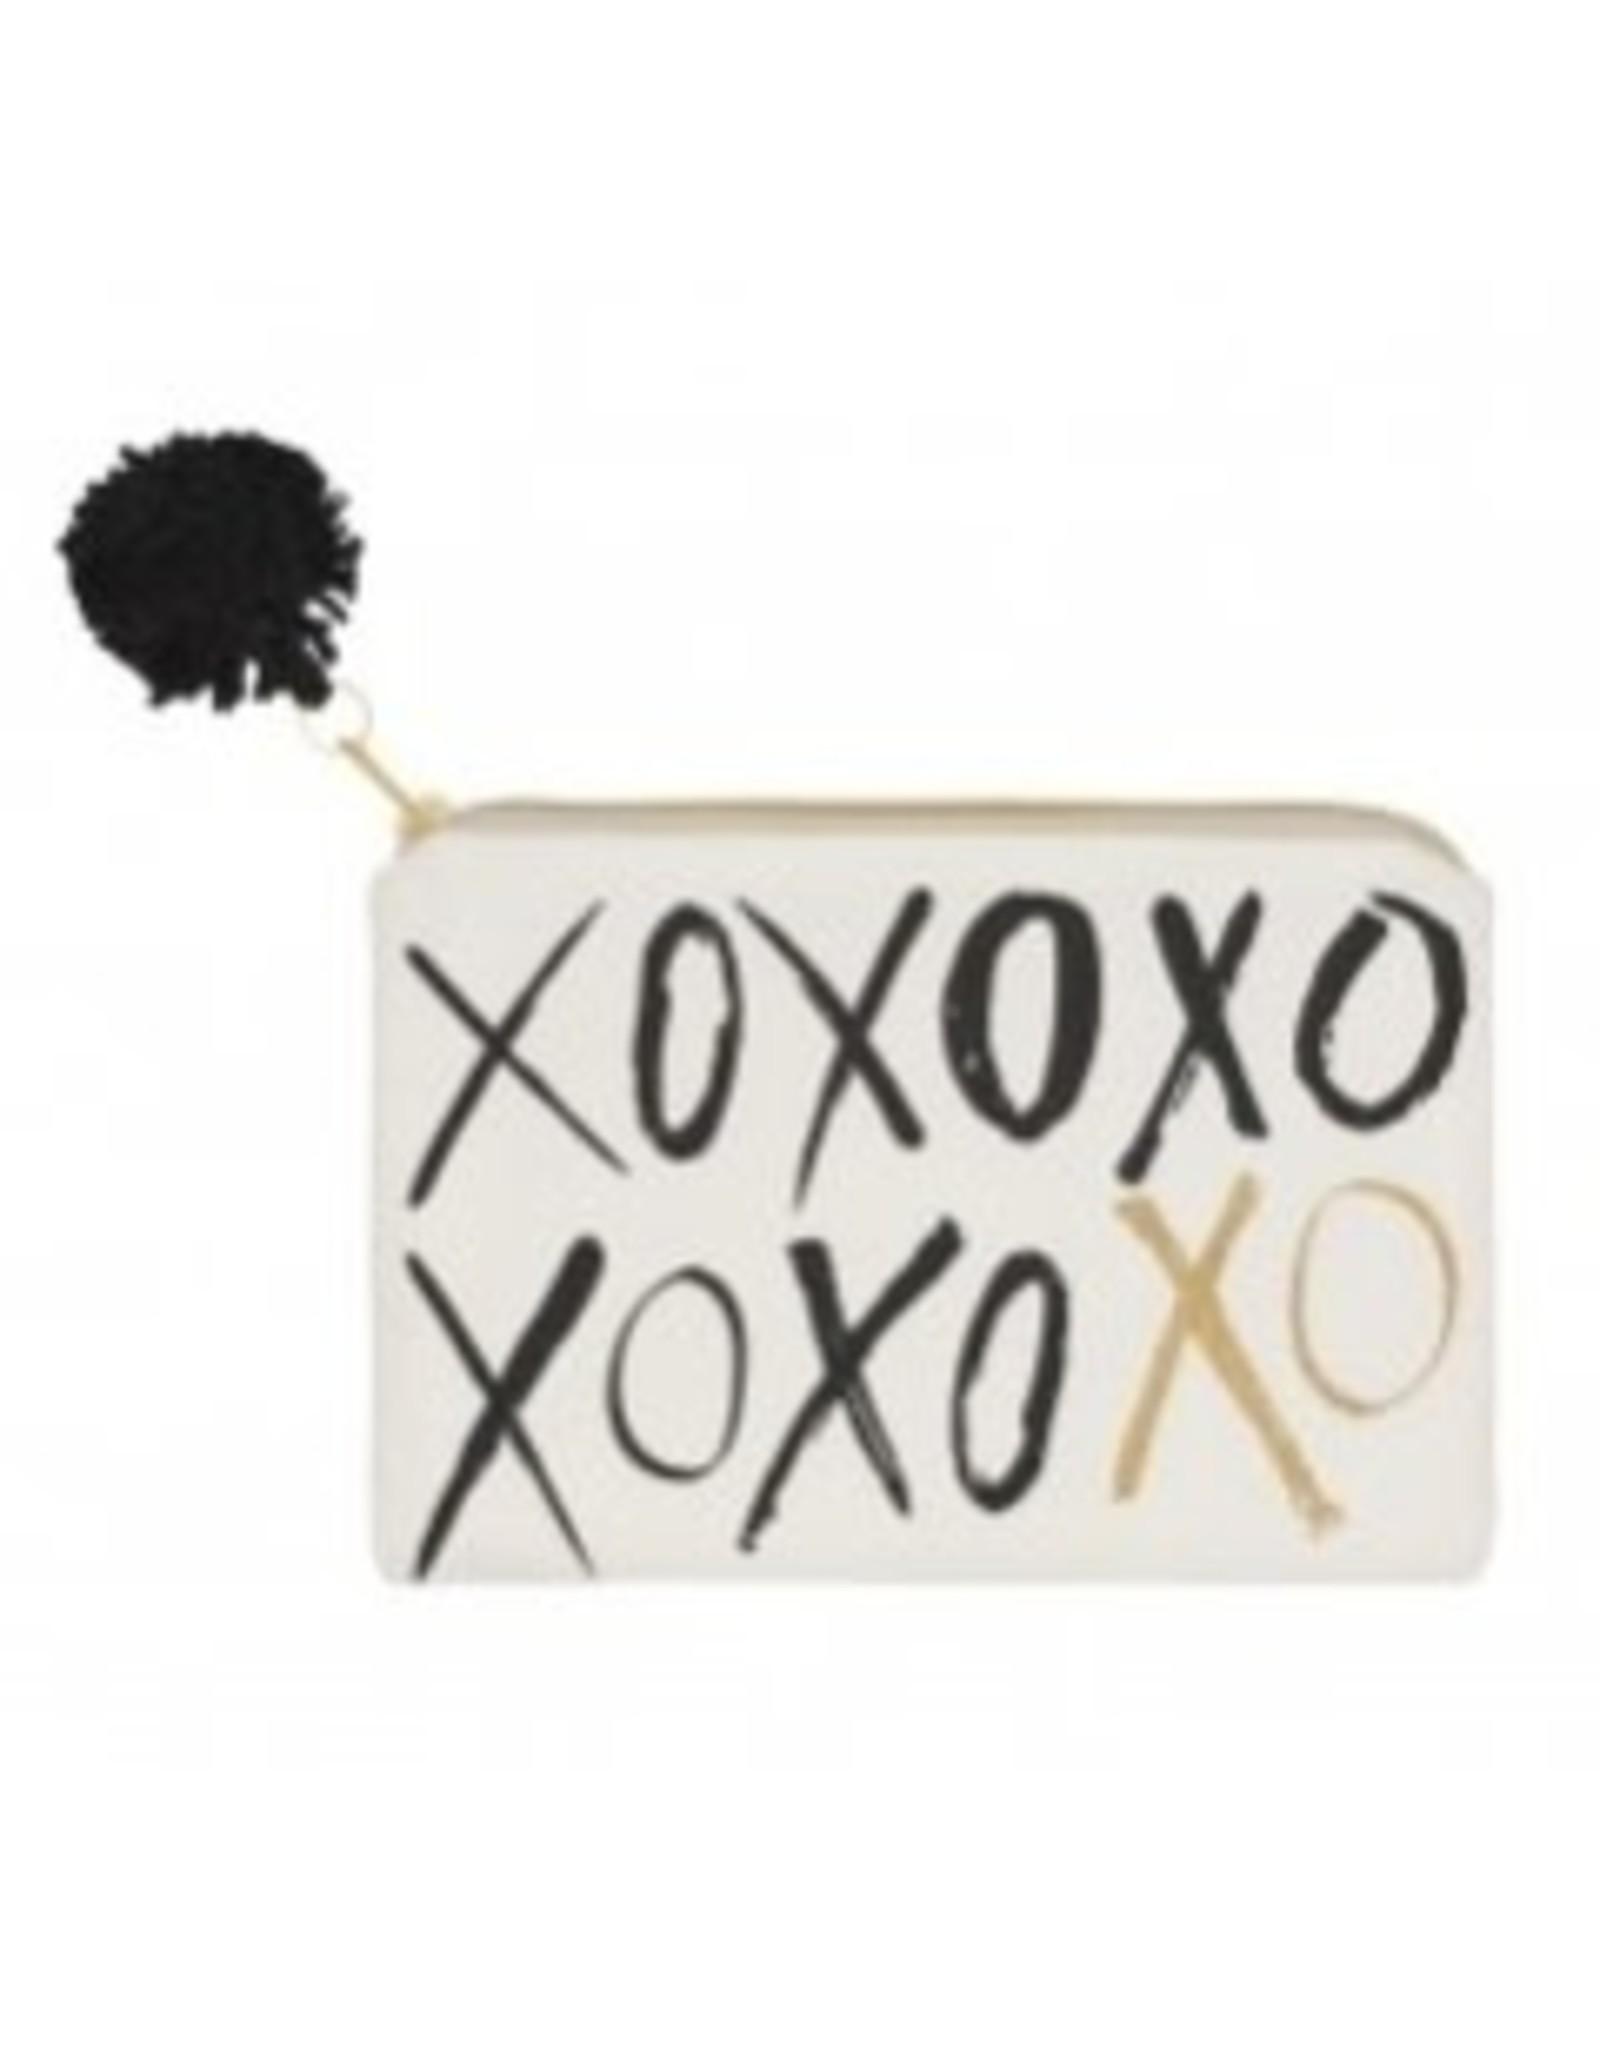 Collins Gold XOXO Cosmetic Bag